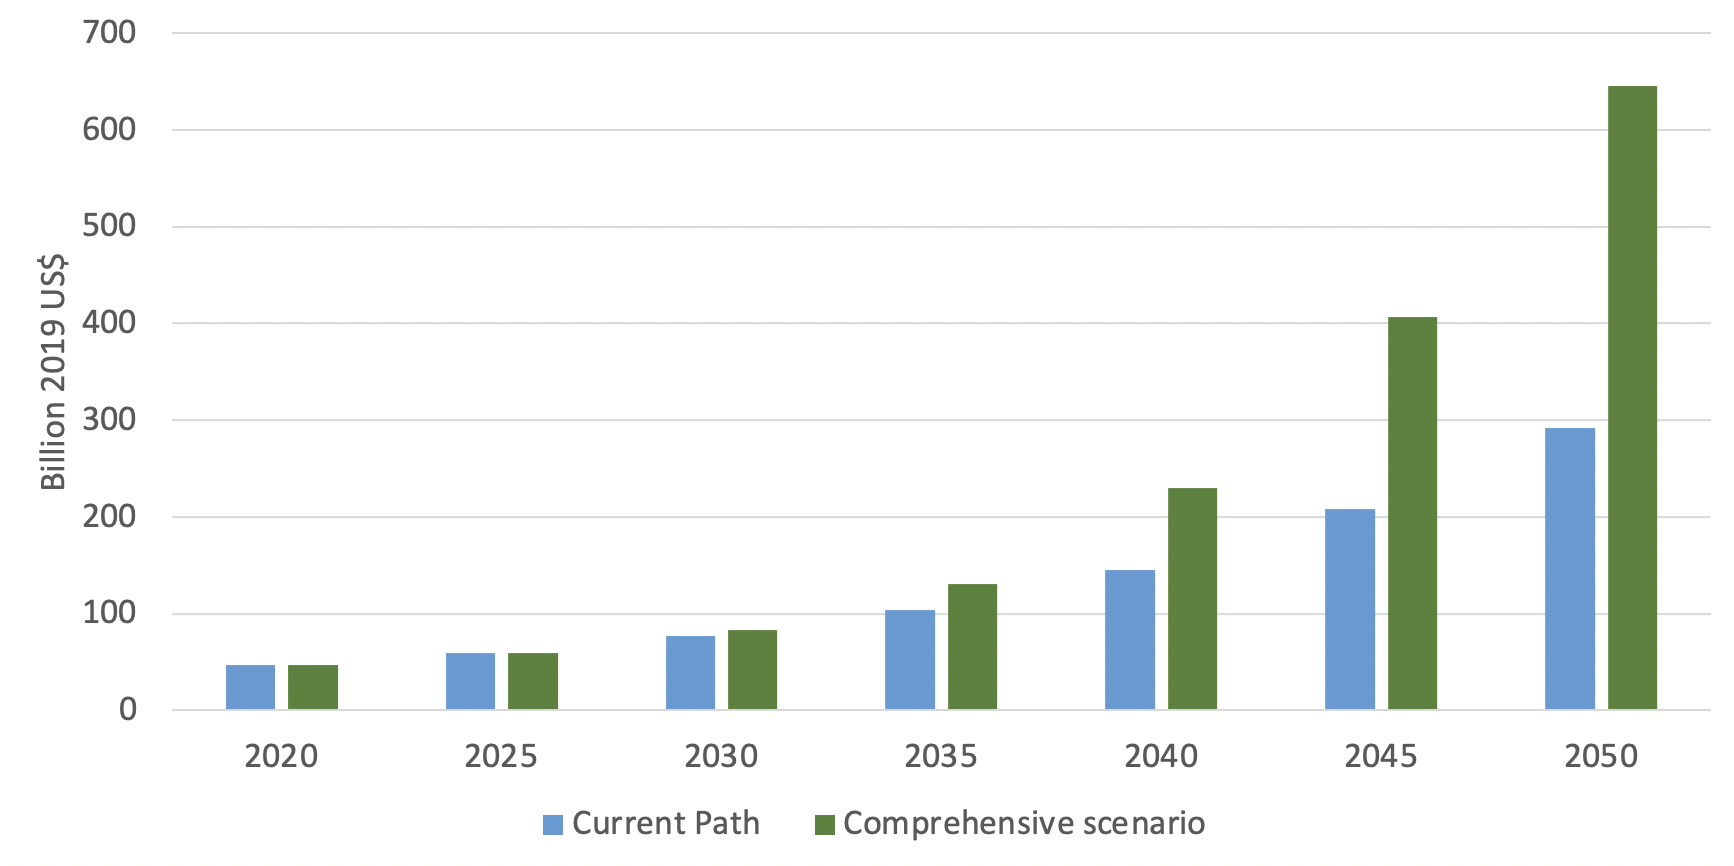 Figure 1: GDP – Comprehensive Scenario vs Current Path